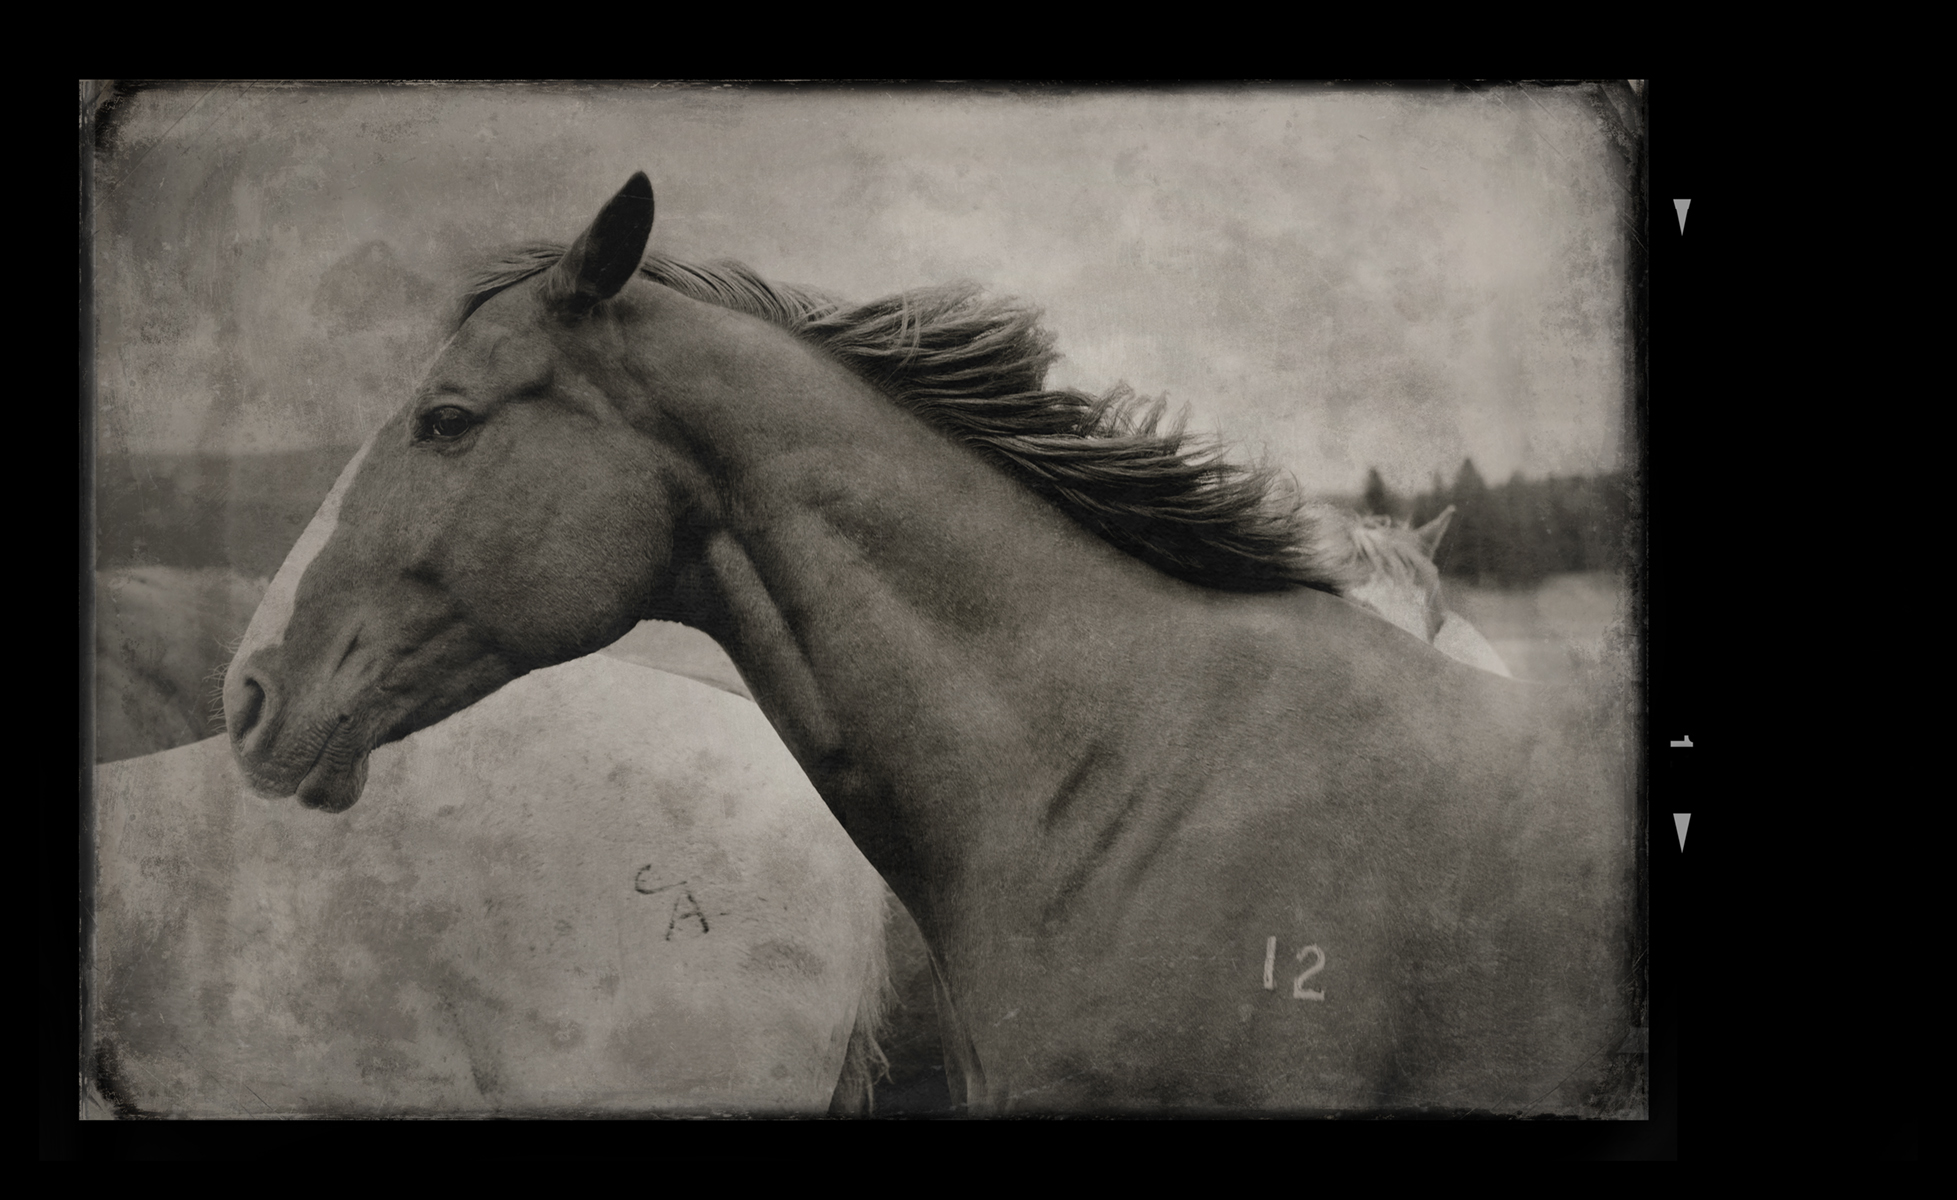 Horse with 12 branding Montana 2012